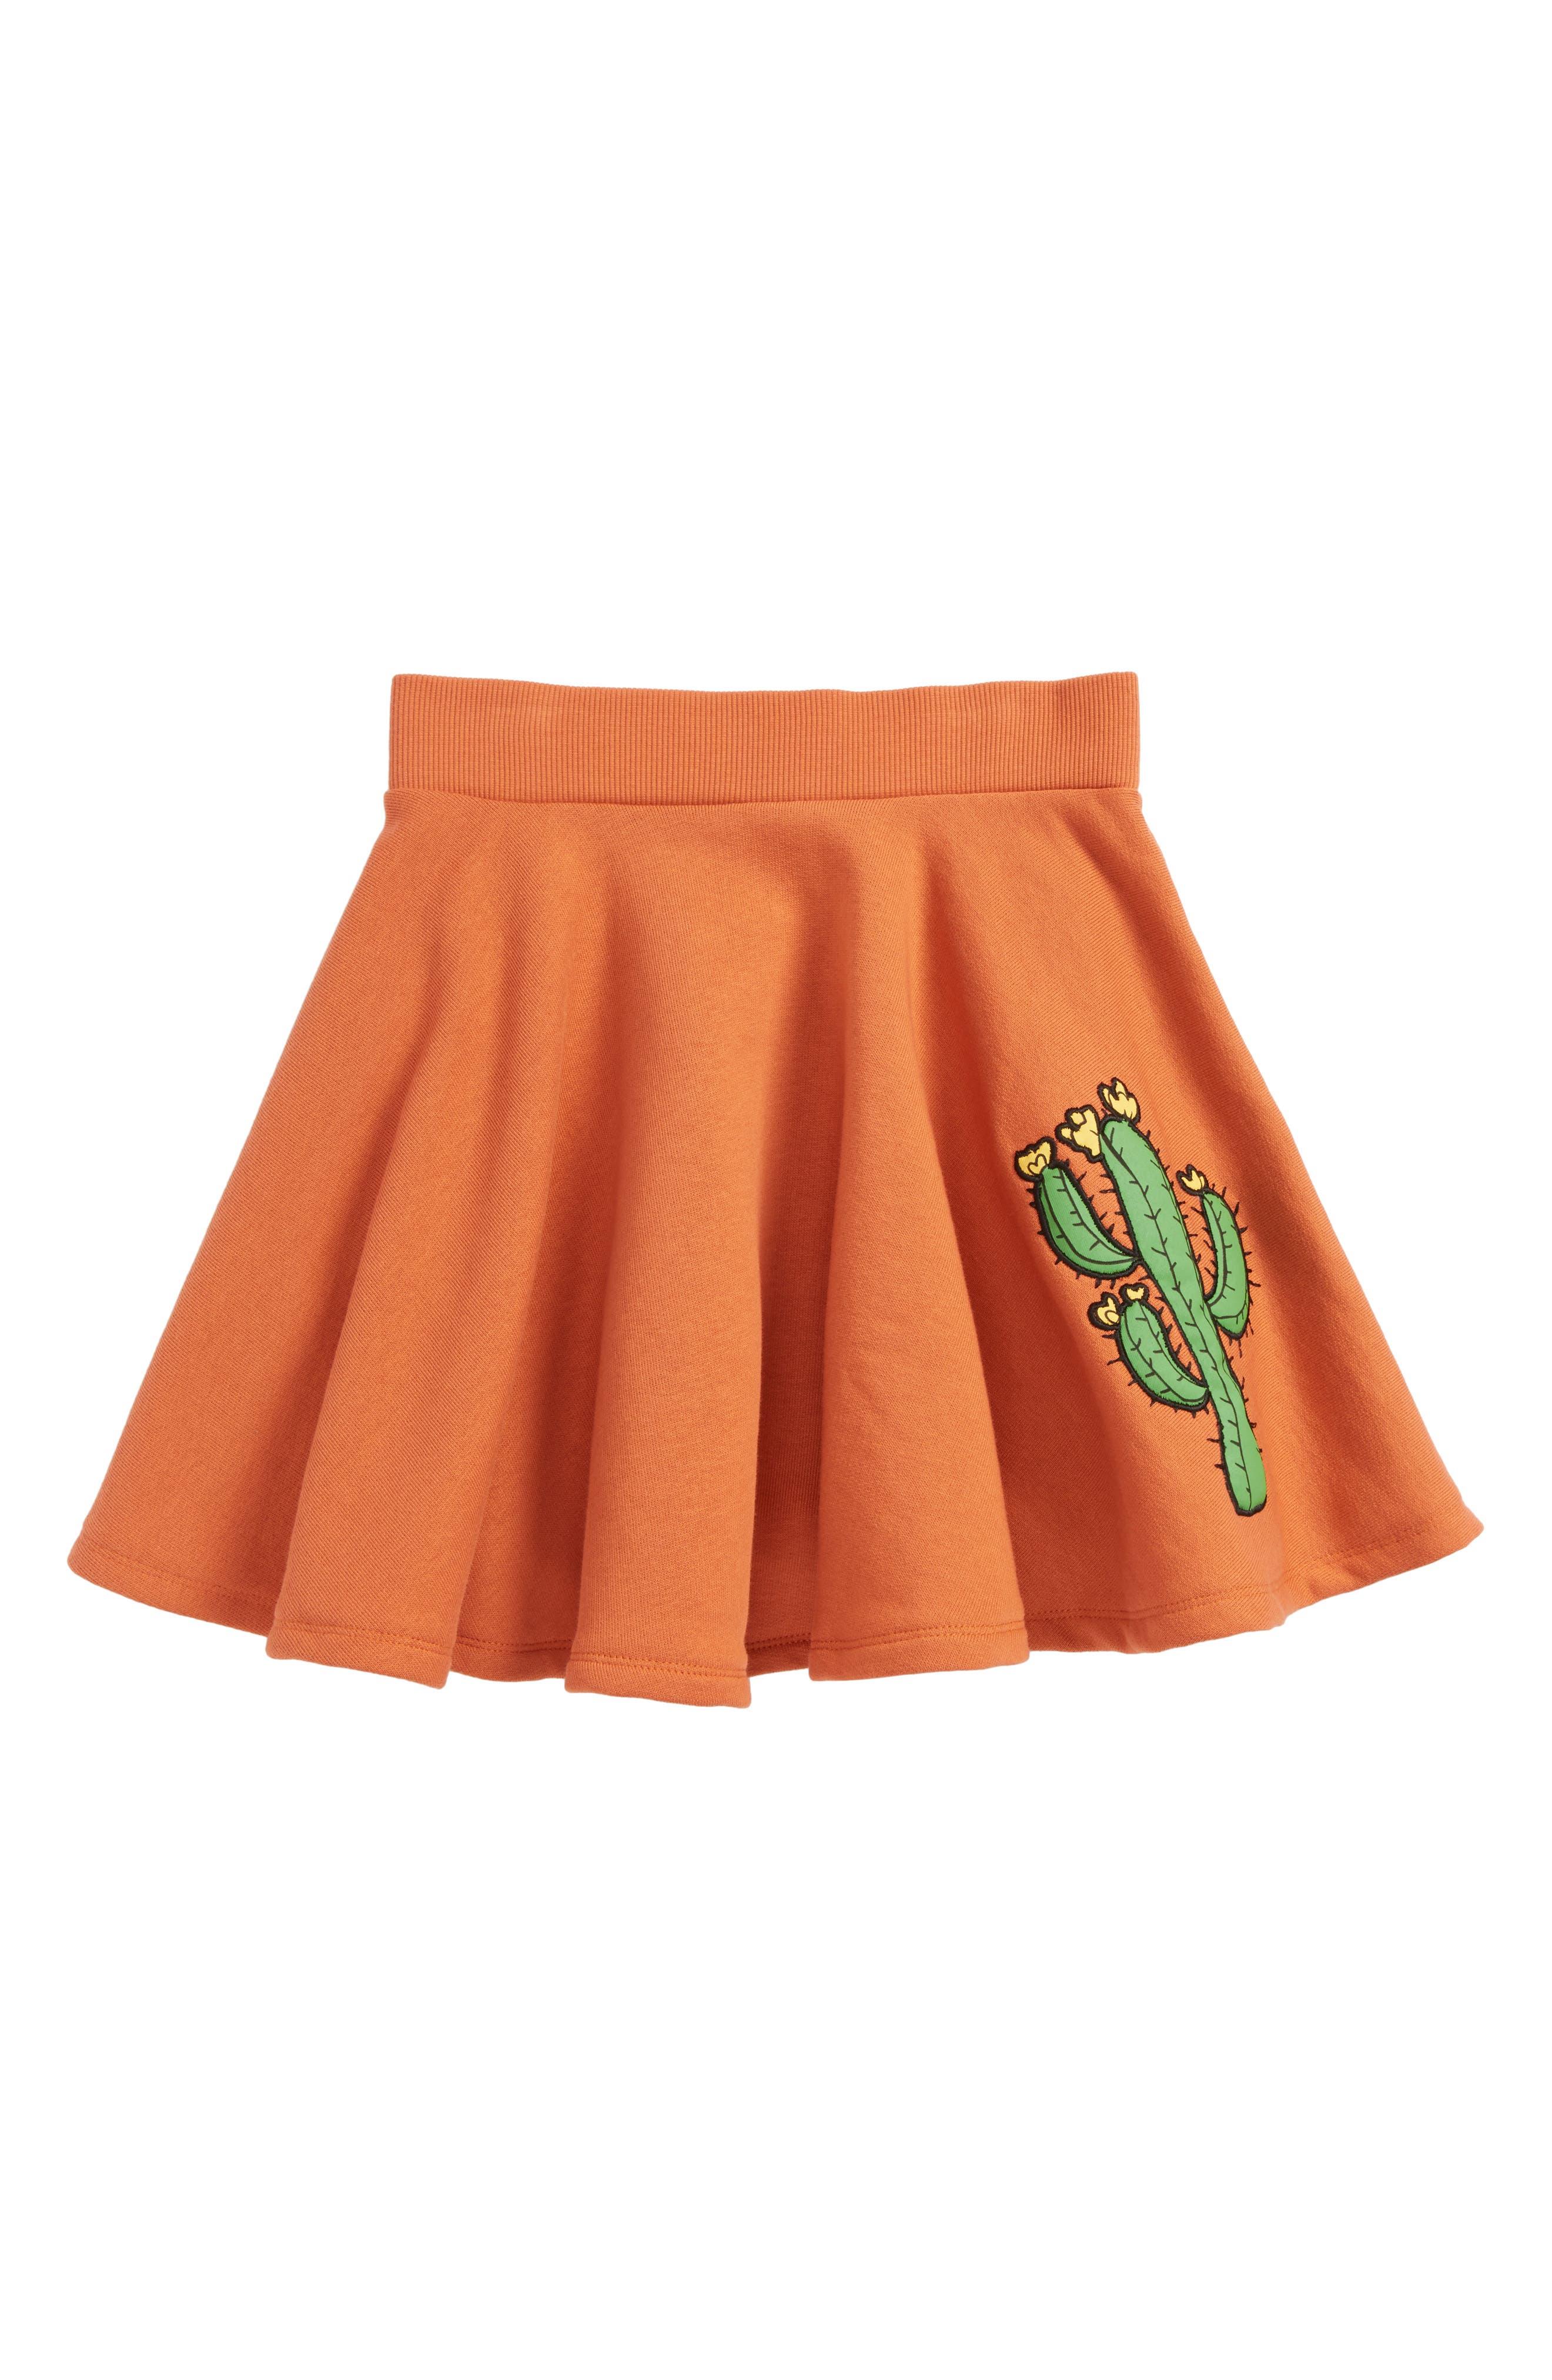 Appliqué Cactus Organic Cotton Circle Skirt,                         Main,                         color, 800